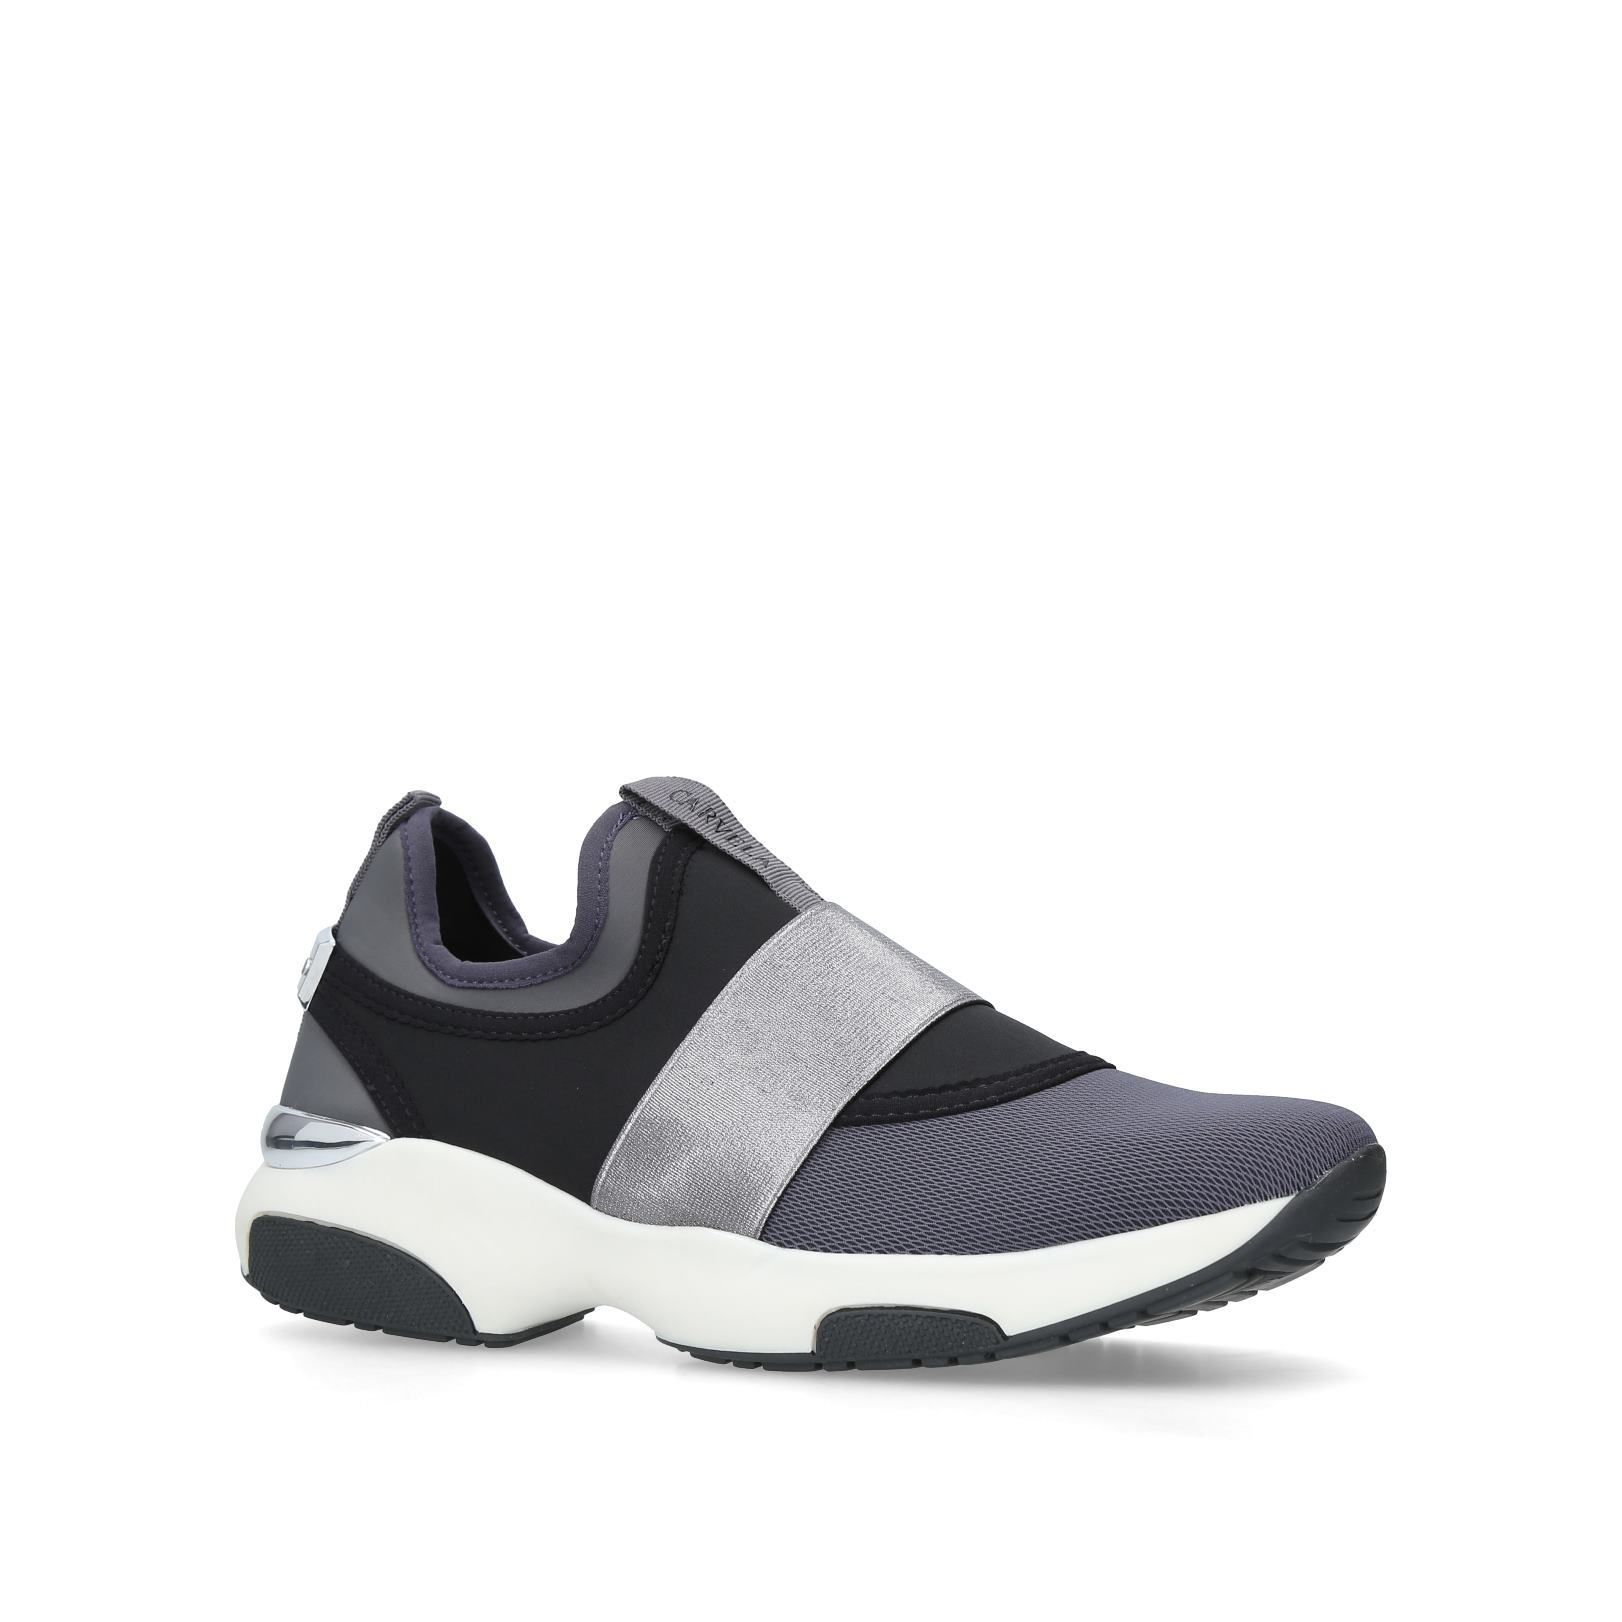 LAIDBACK - CARVELA Sneakers